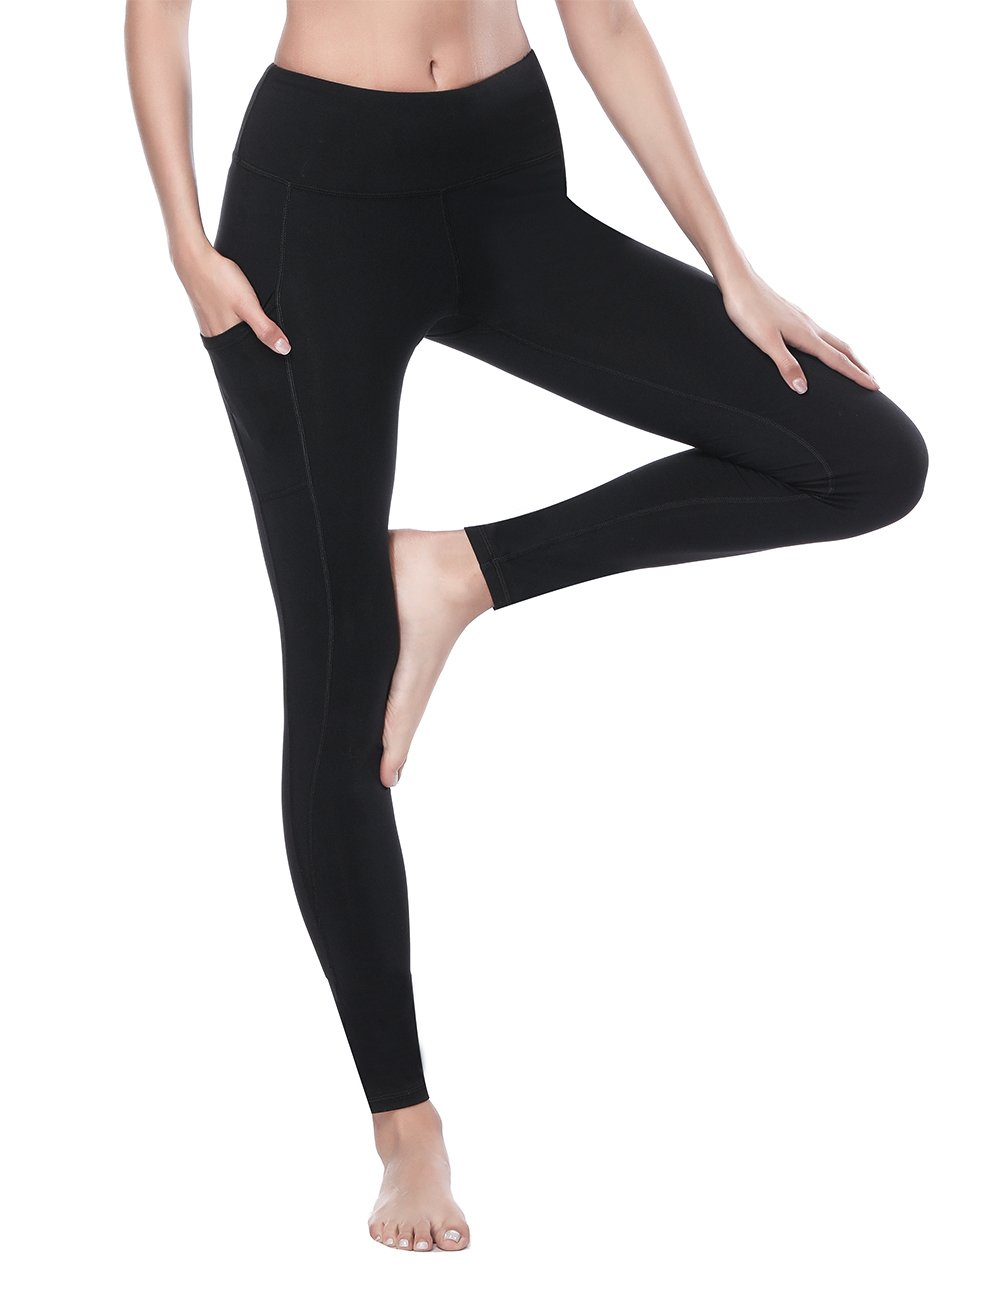 ALONG FIT Yoga Pants for Women Shorts Leggings for Women Capri Leggings Leggings with Pockets